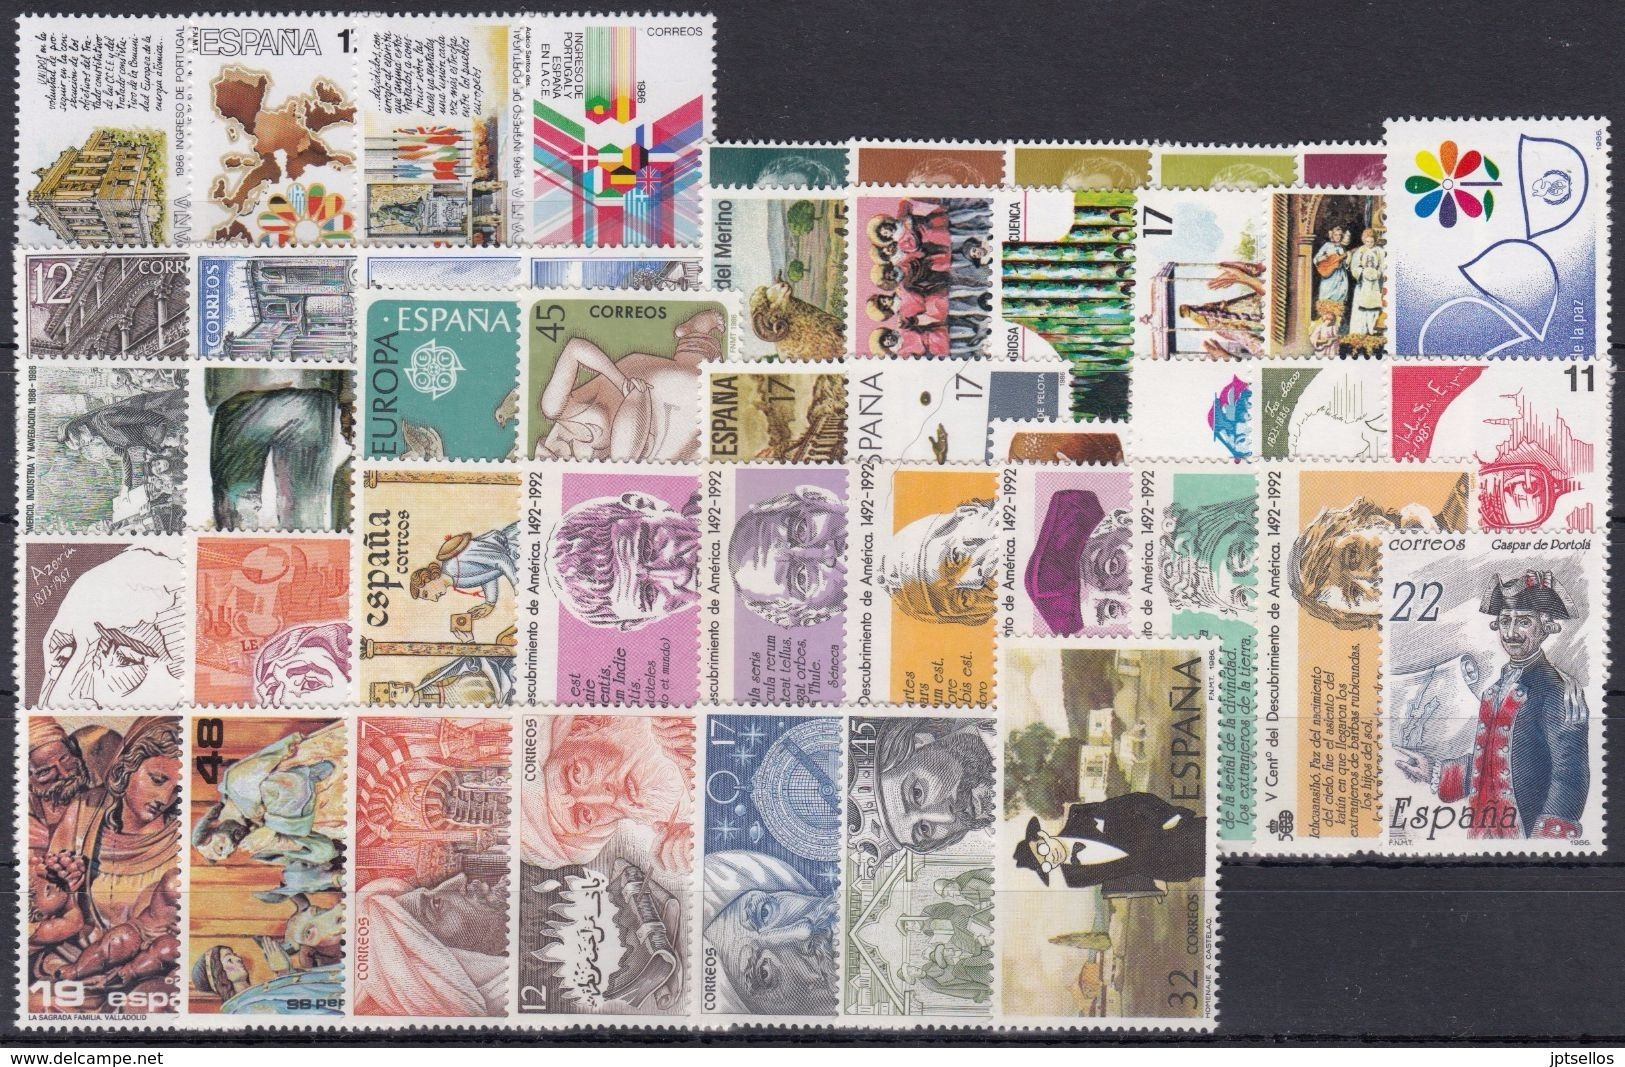 ESPAÑA 1986 Nº2825/2873 AÑO NUEVO COMPLETO,47 SELLOS,1 HB,4 CARNETS - Full Years